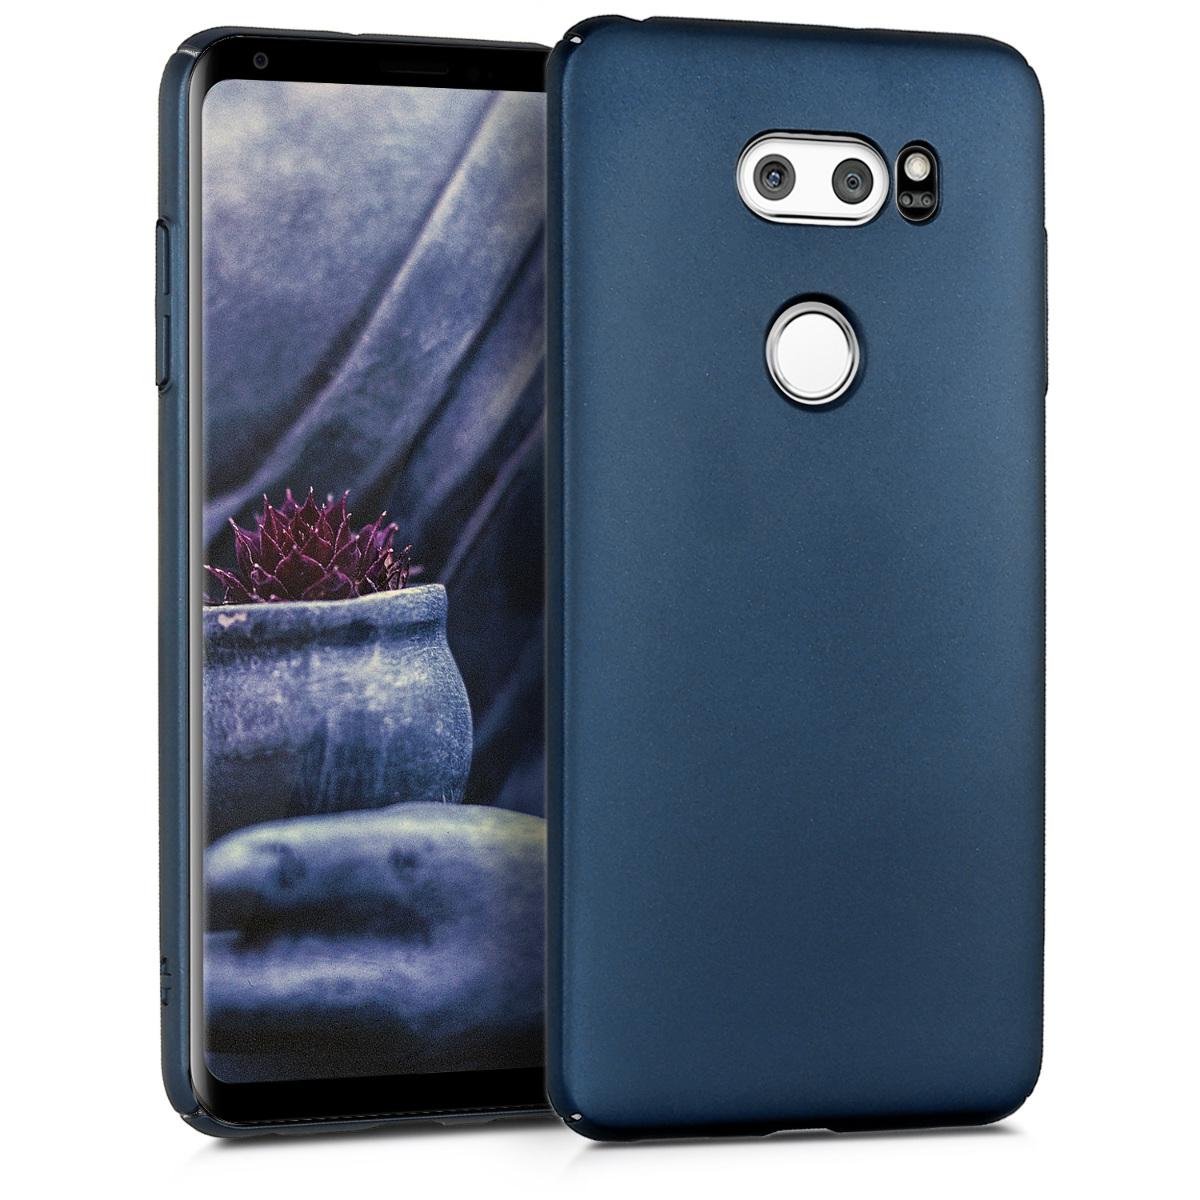 KW Slim Anti-Slip Cover - Σκληρή Θήκη Καουτσούκ LG V30 - Metallic Dark Blue (43276.99)